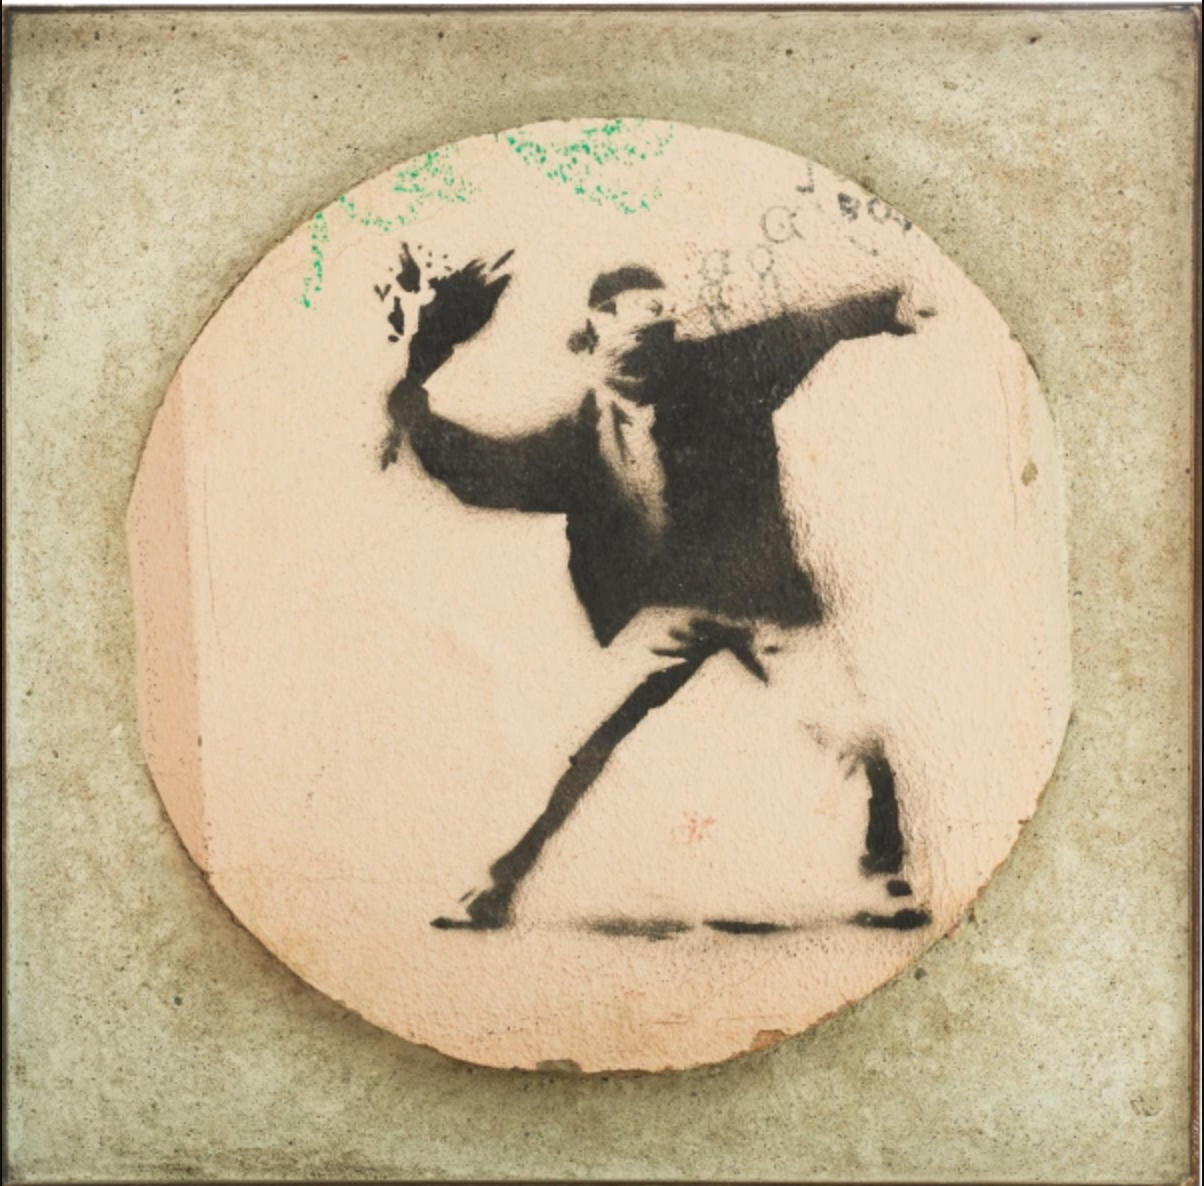 Banksy (b. 1974) Flower Thrower (Wall), c. 2008